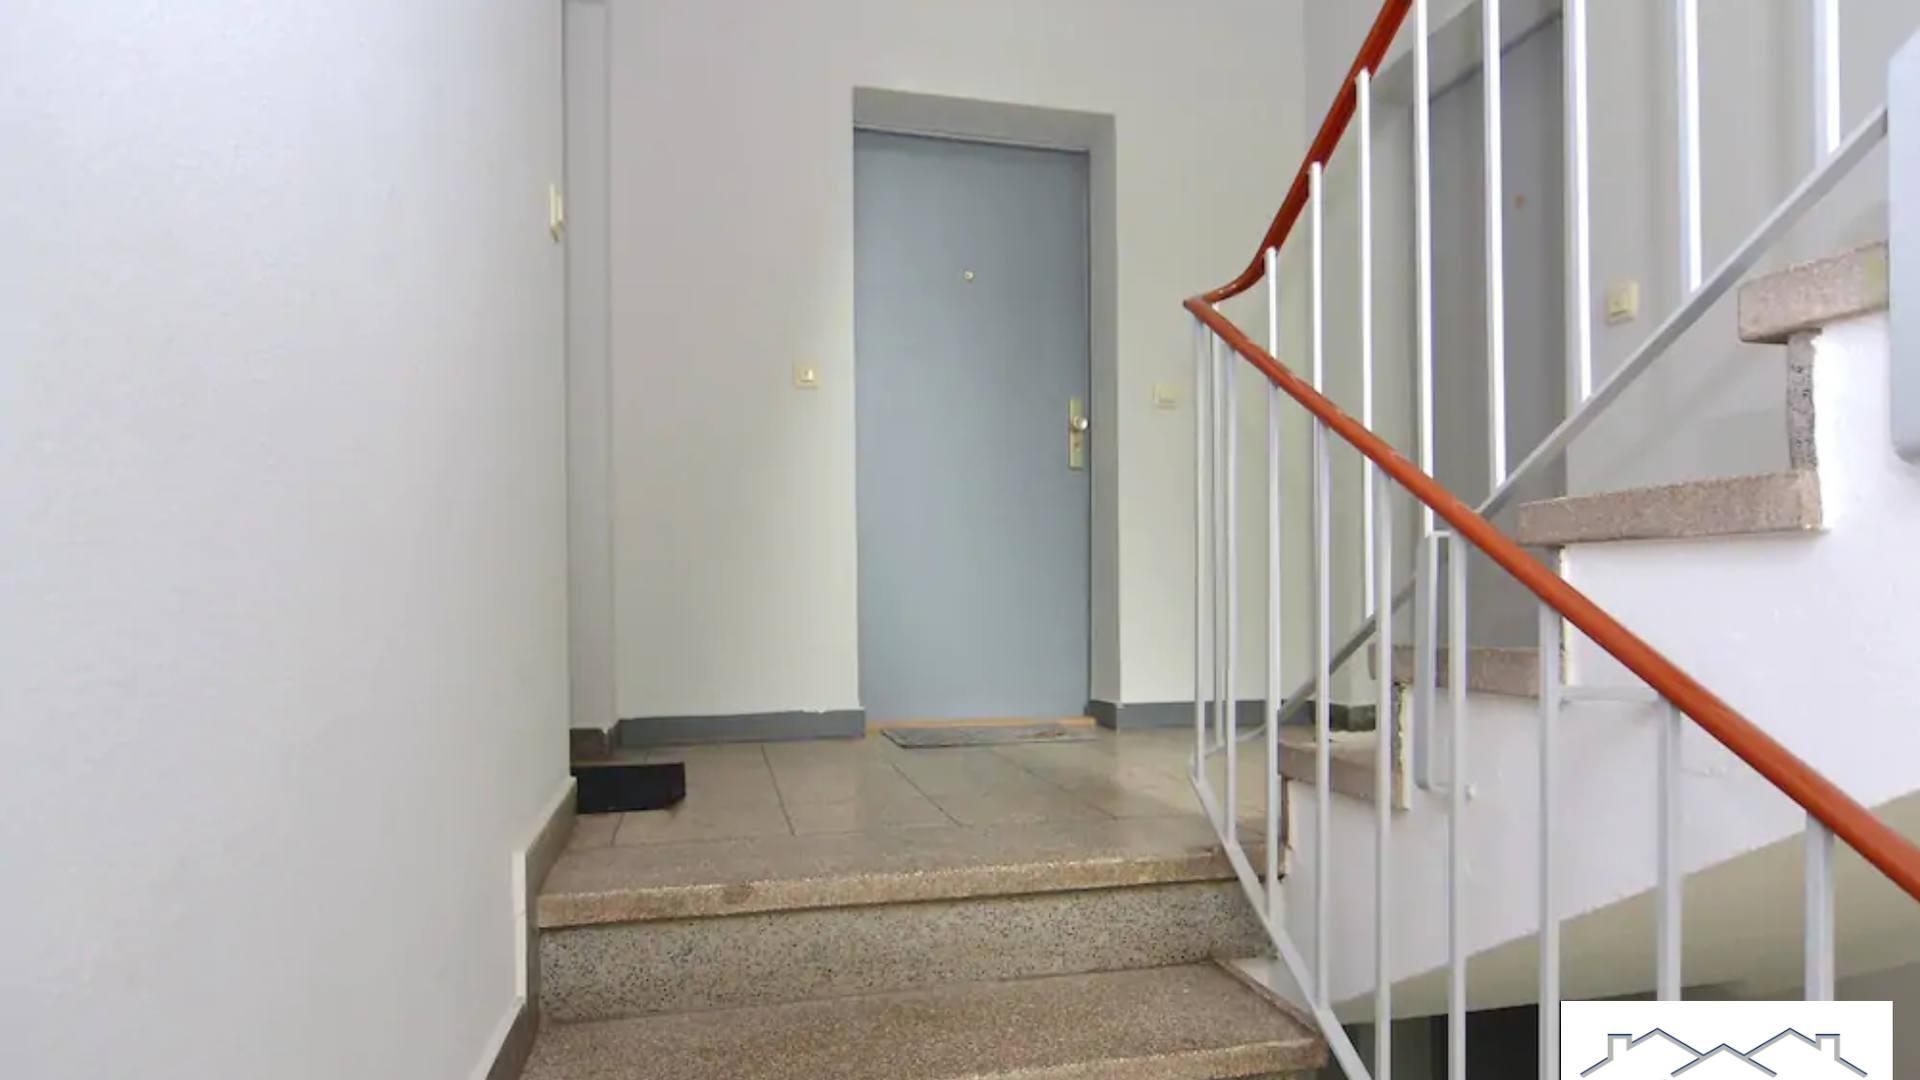 Apartment_Wiesbaden11.jpg